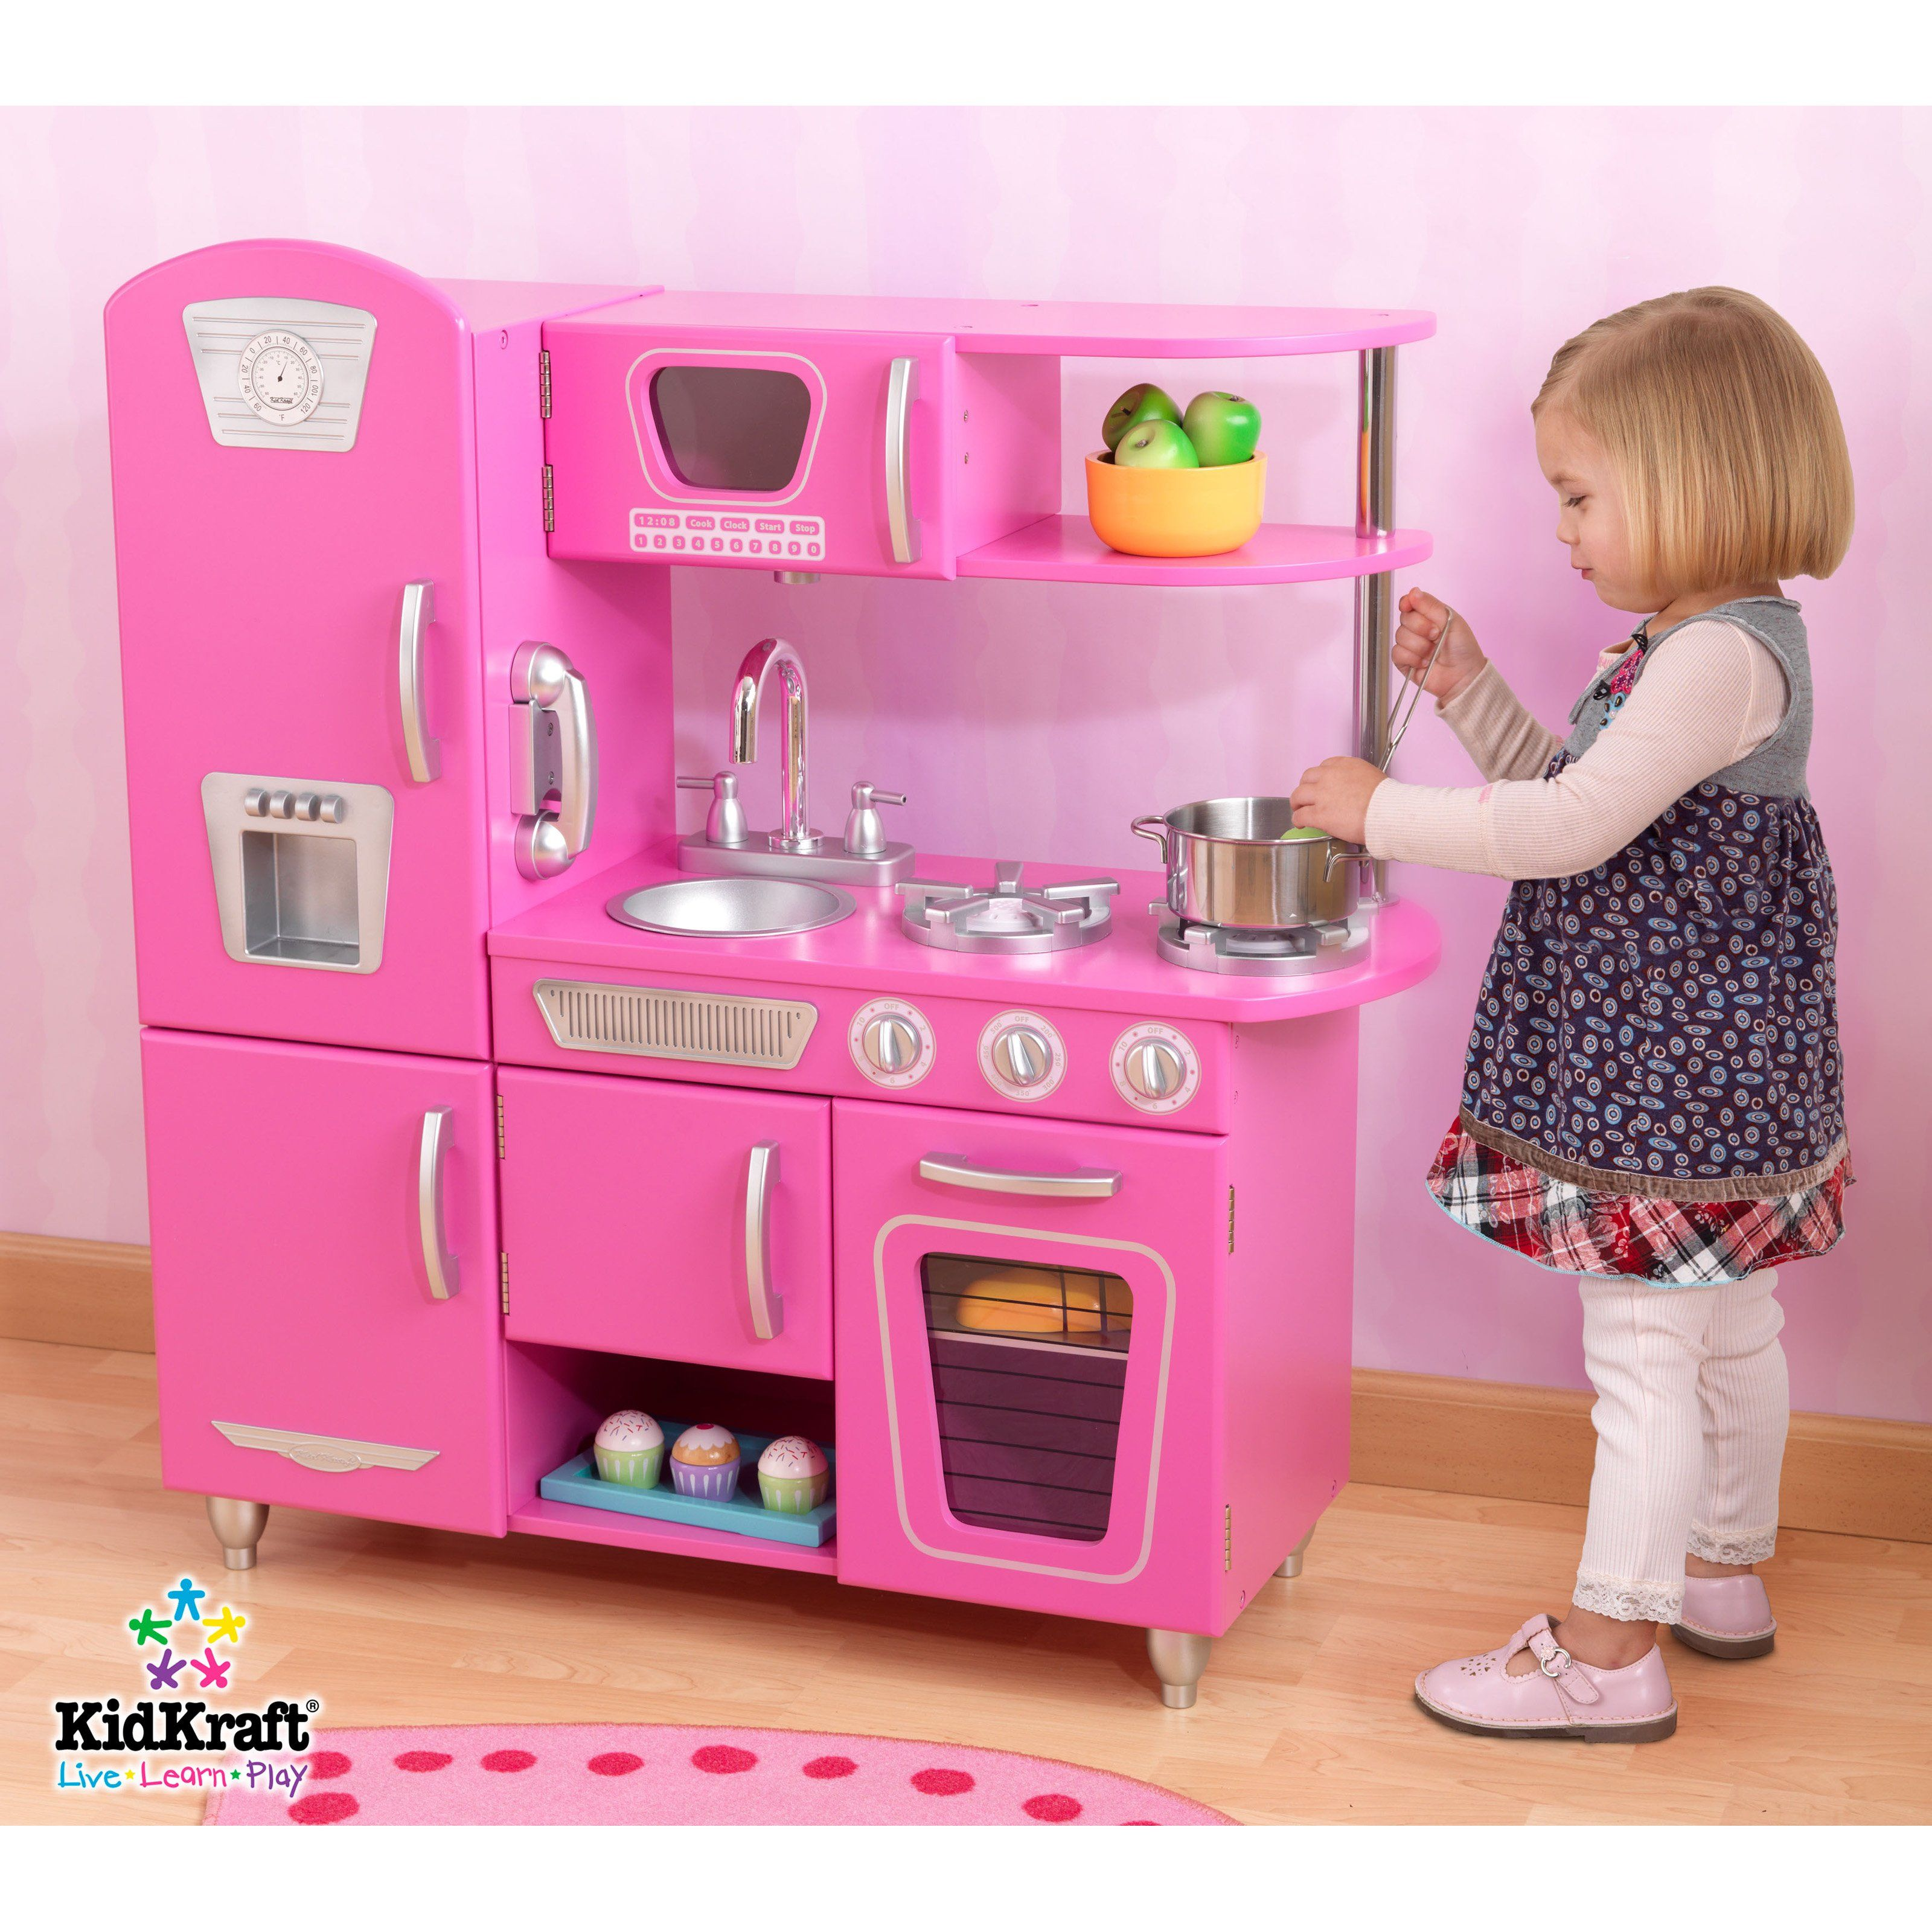 Kidkraft large pastel kitchen  Have to have it KidKraft Bubblegum Vintage Kitchen  this is